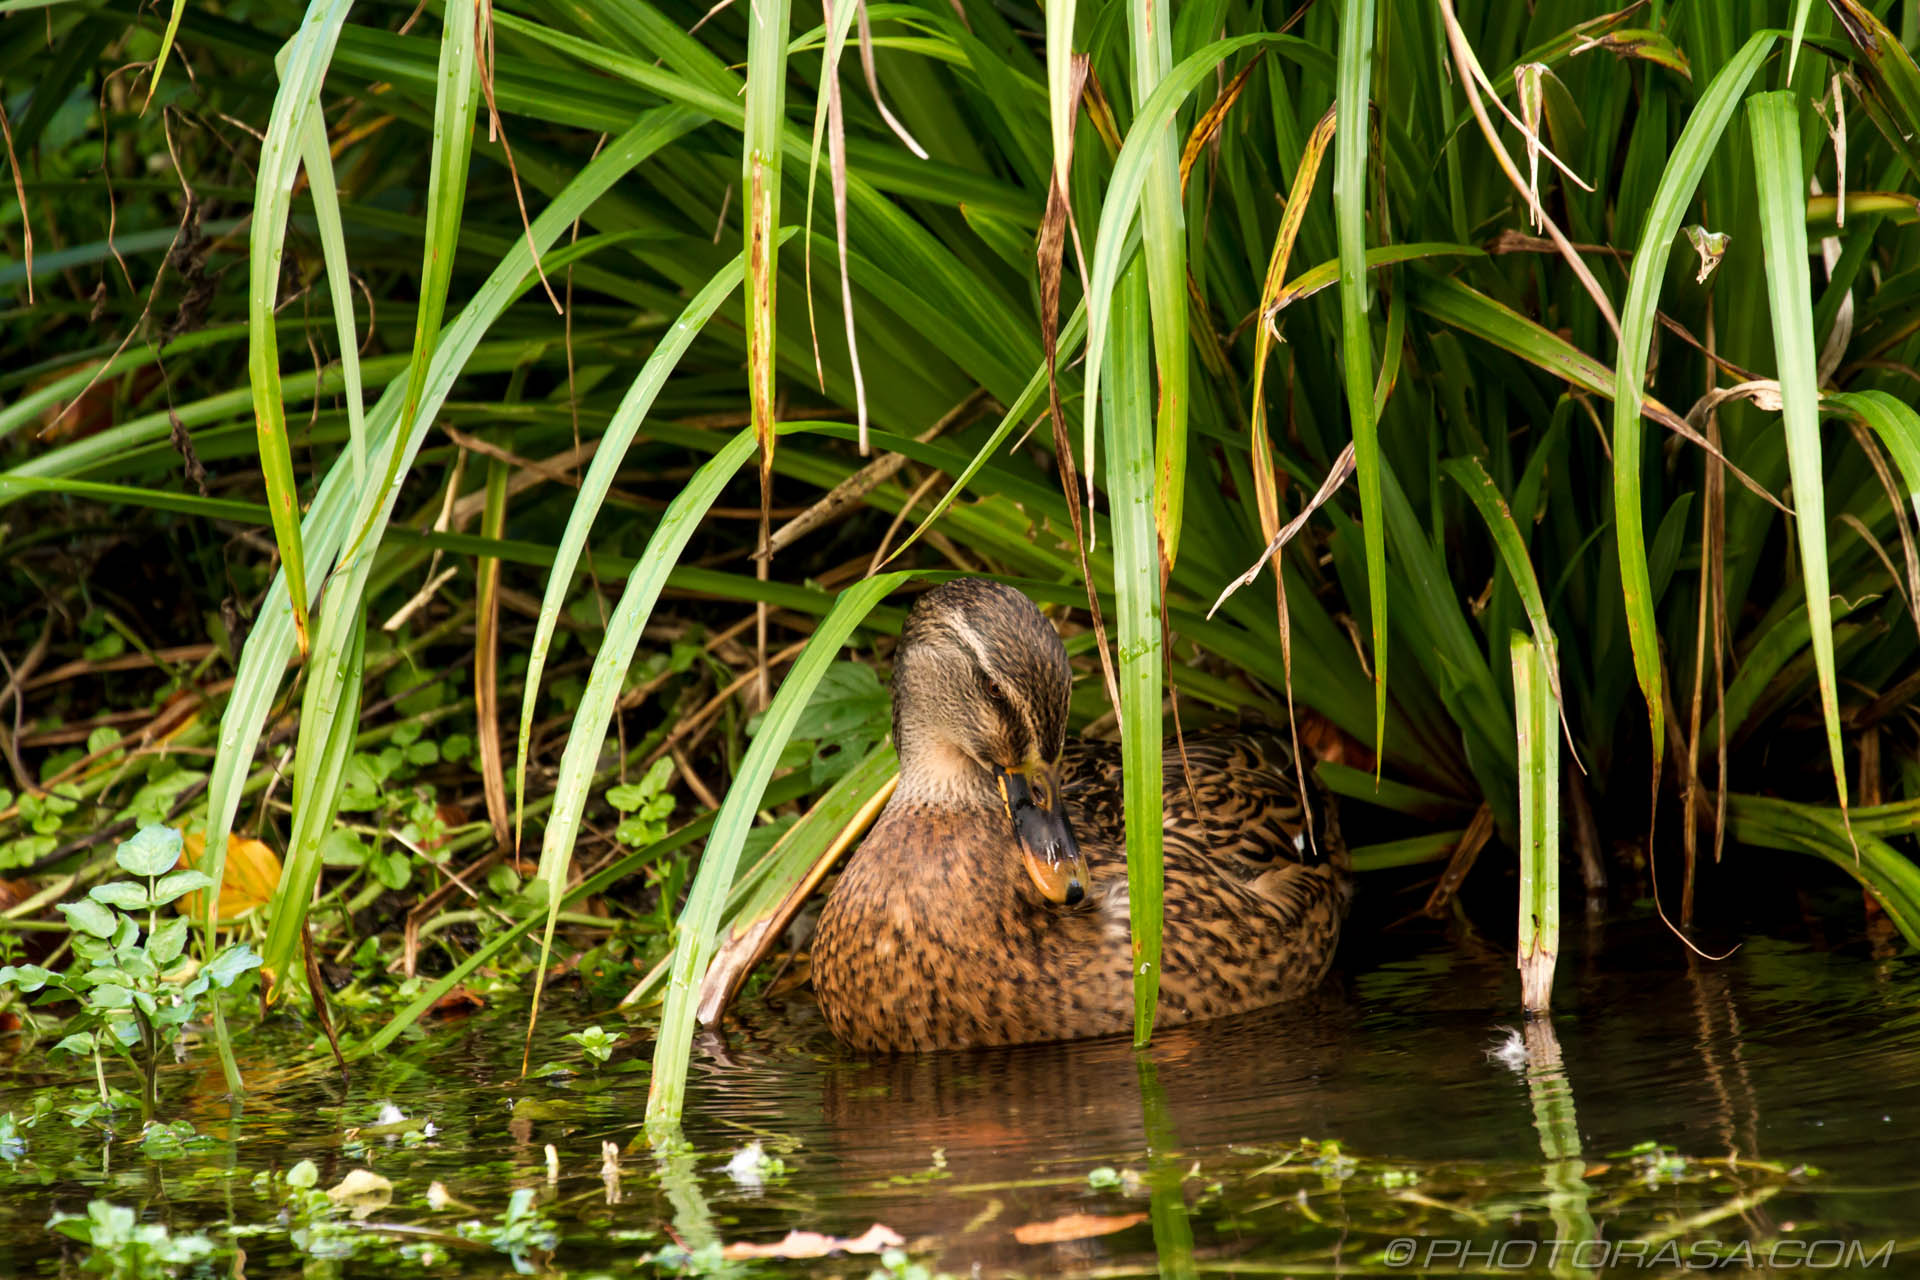 https://photorasa.com/mallard-ducks/mallard-under-the-green-reeds/